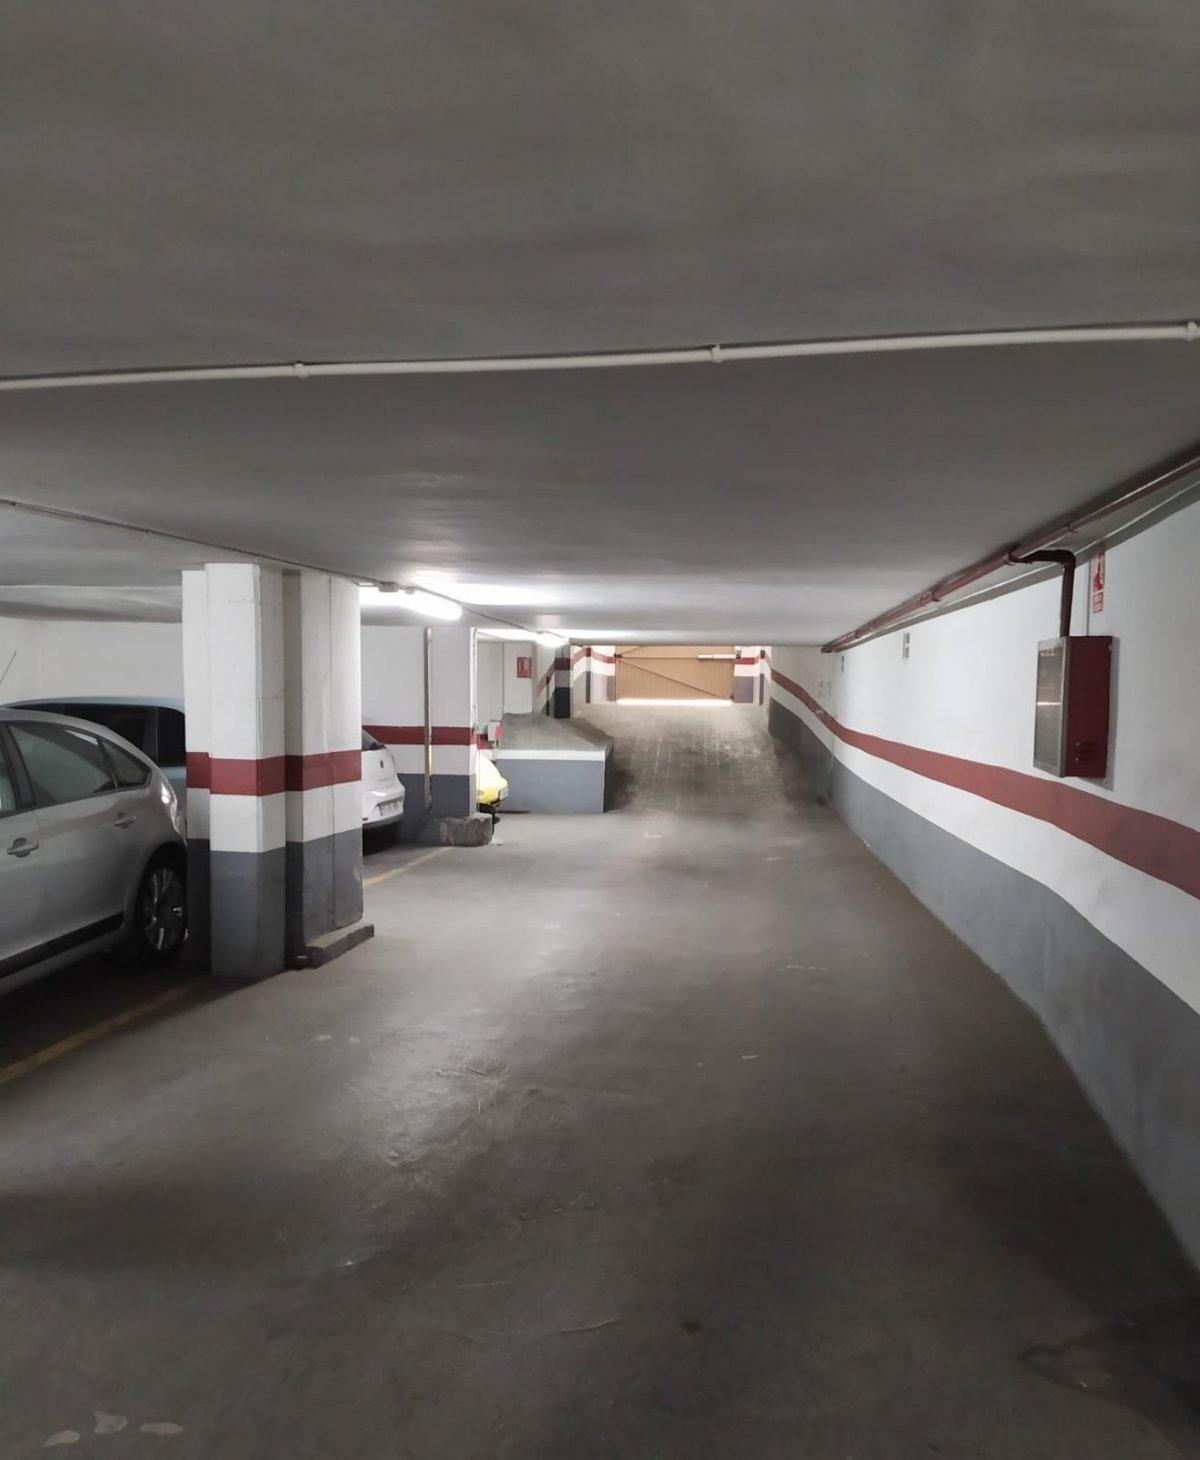 Rent Car parking  Quart de poblet ,colegio ramón la porta. Garaje en alquiler situado cercano a colegio ramón la porta